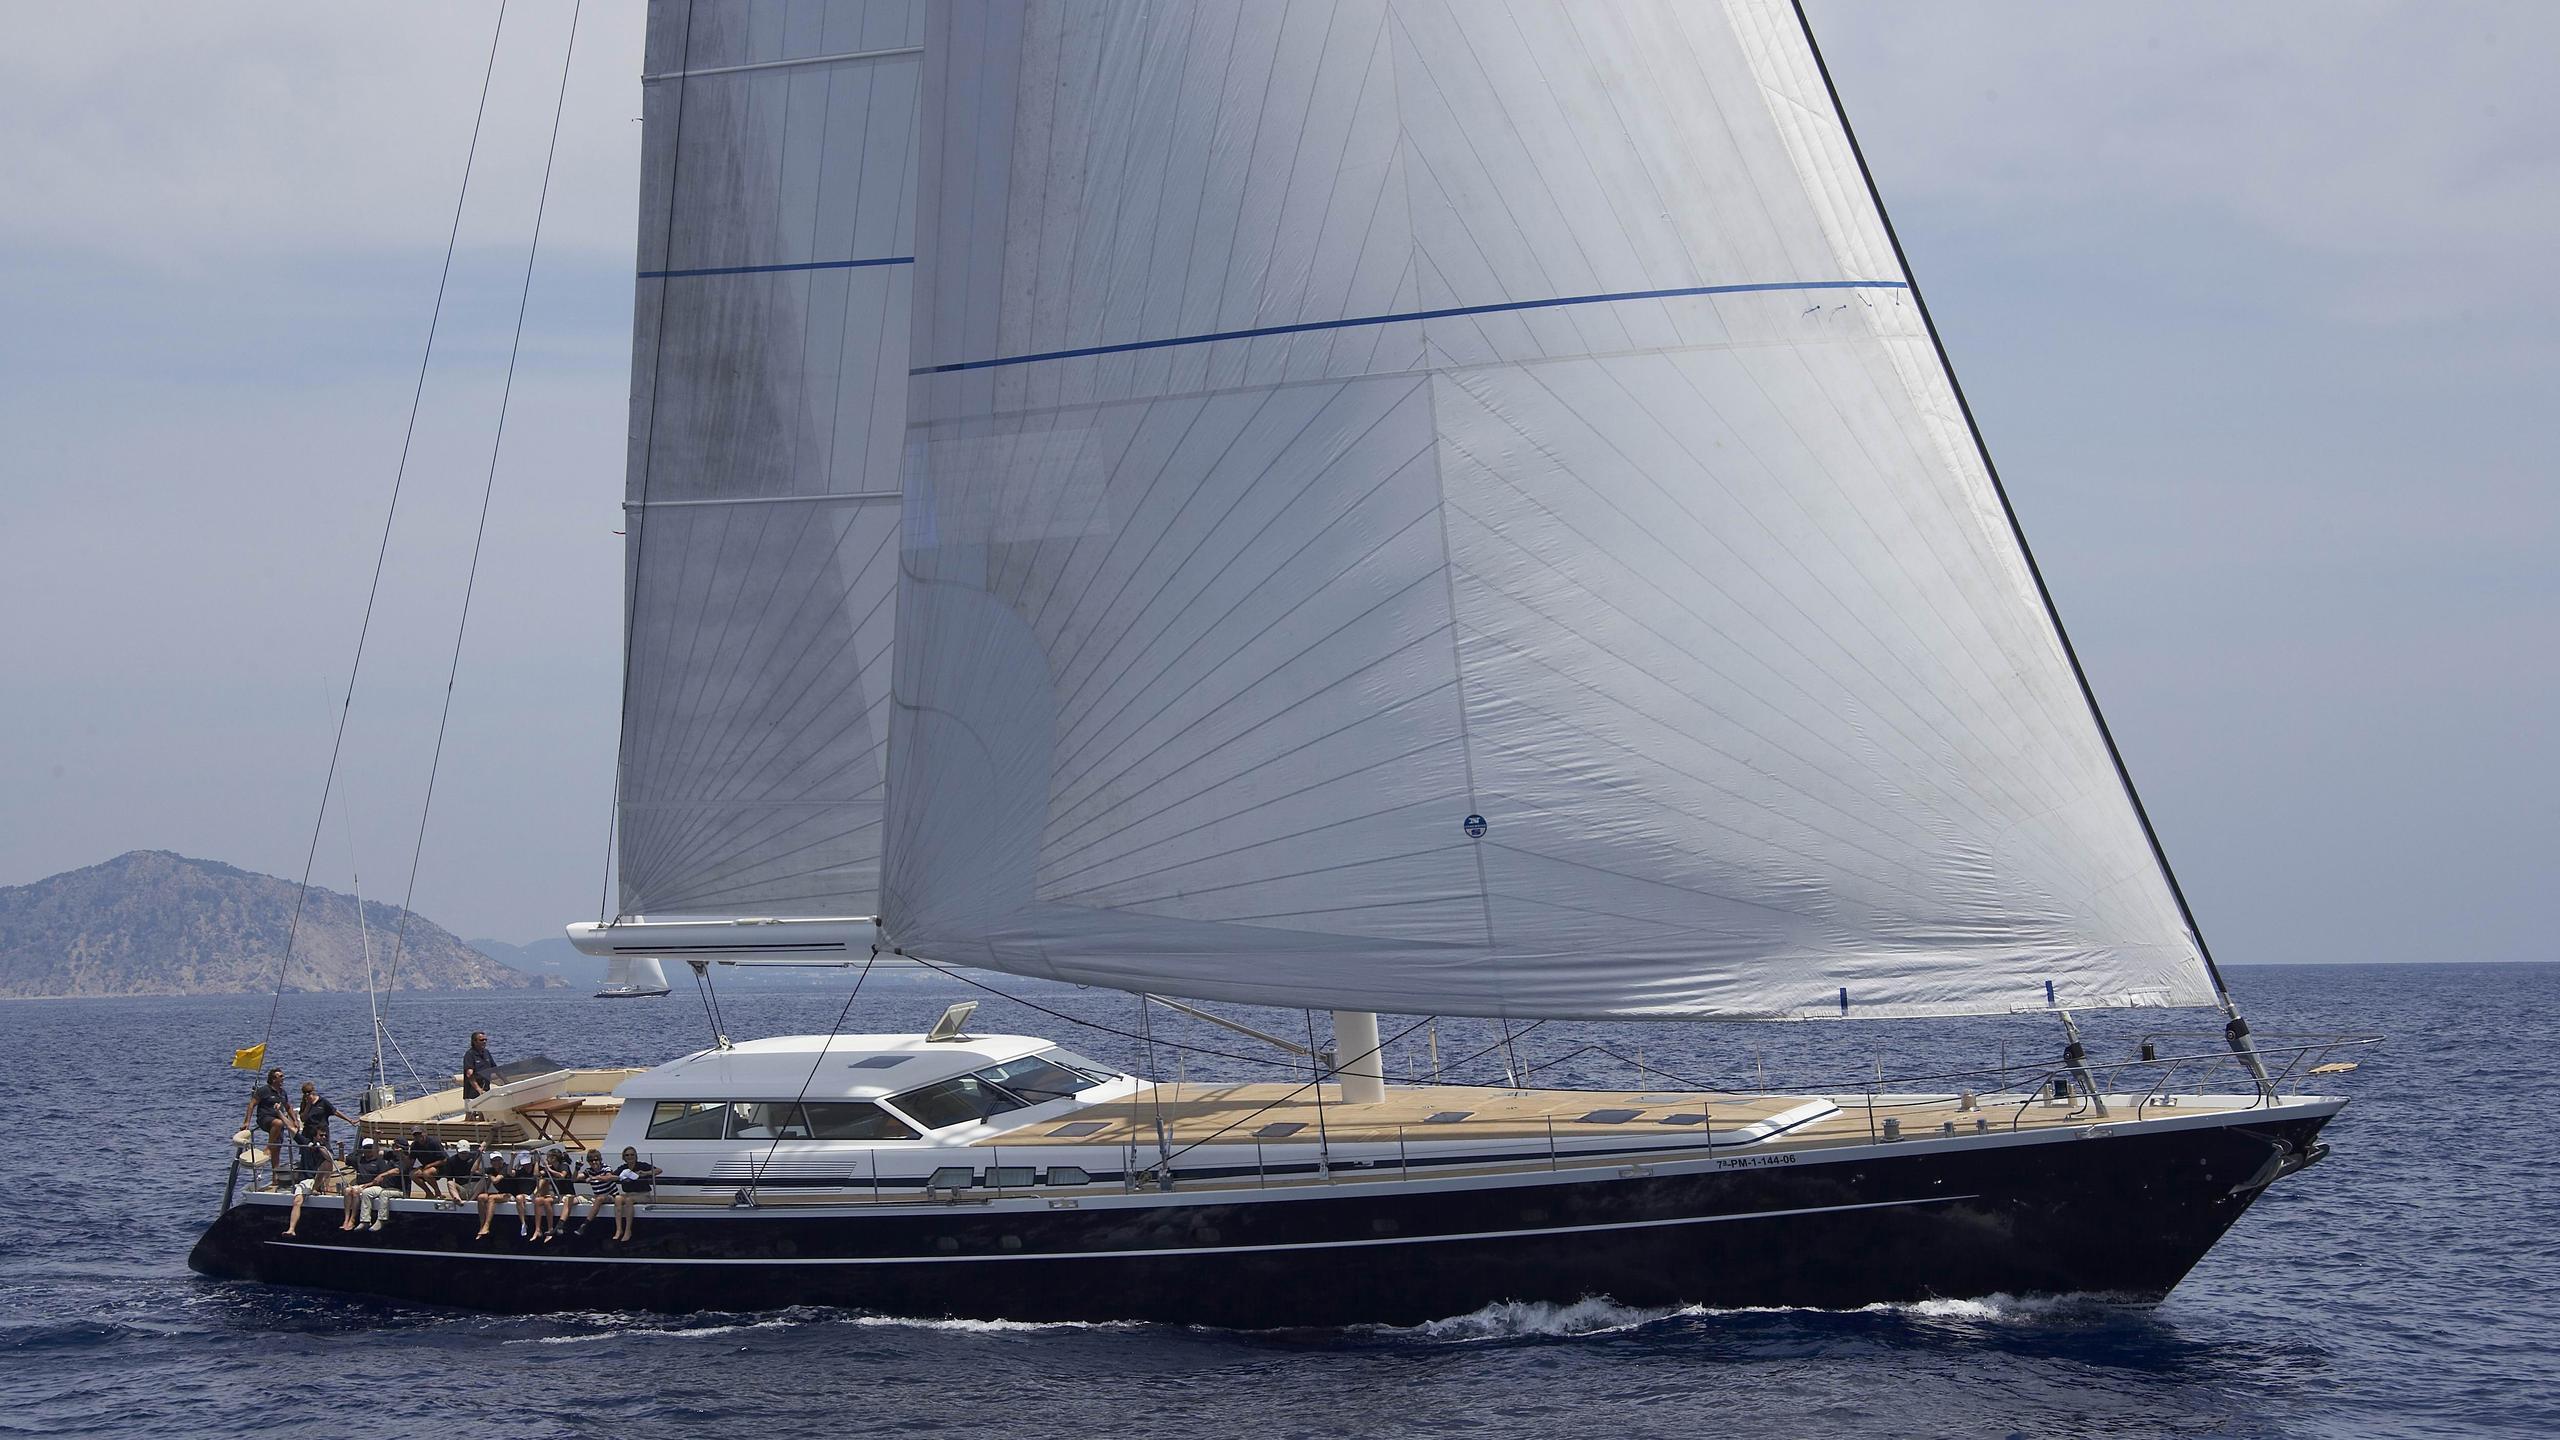 Piaffe II yacht